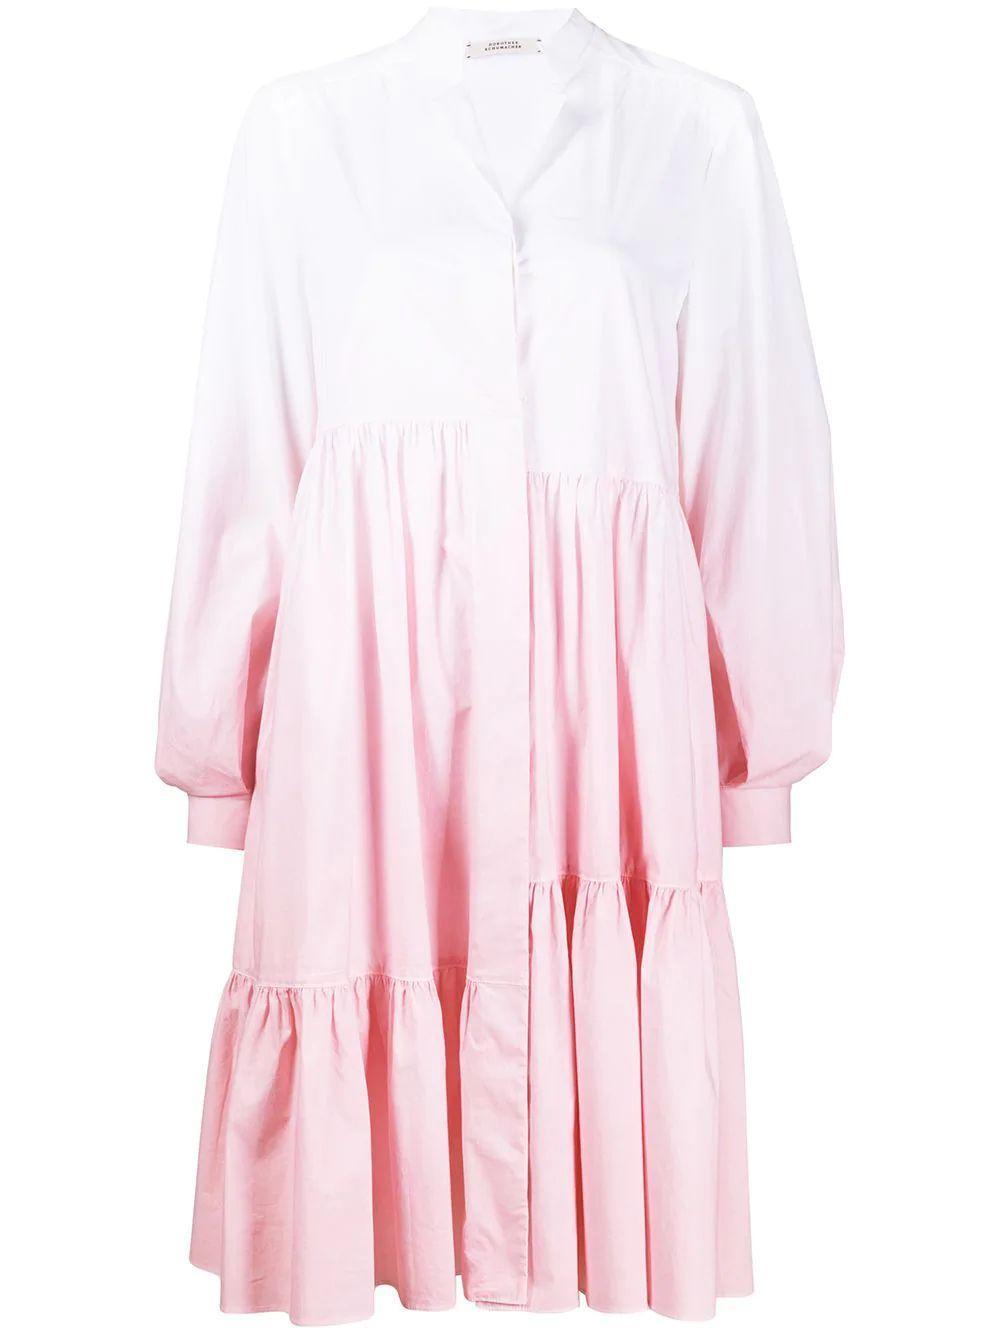 Rising Freshness Midi Dress Item # 748902